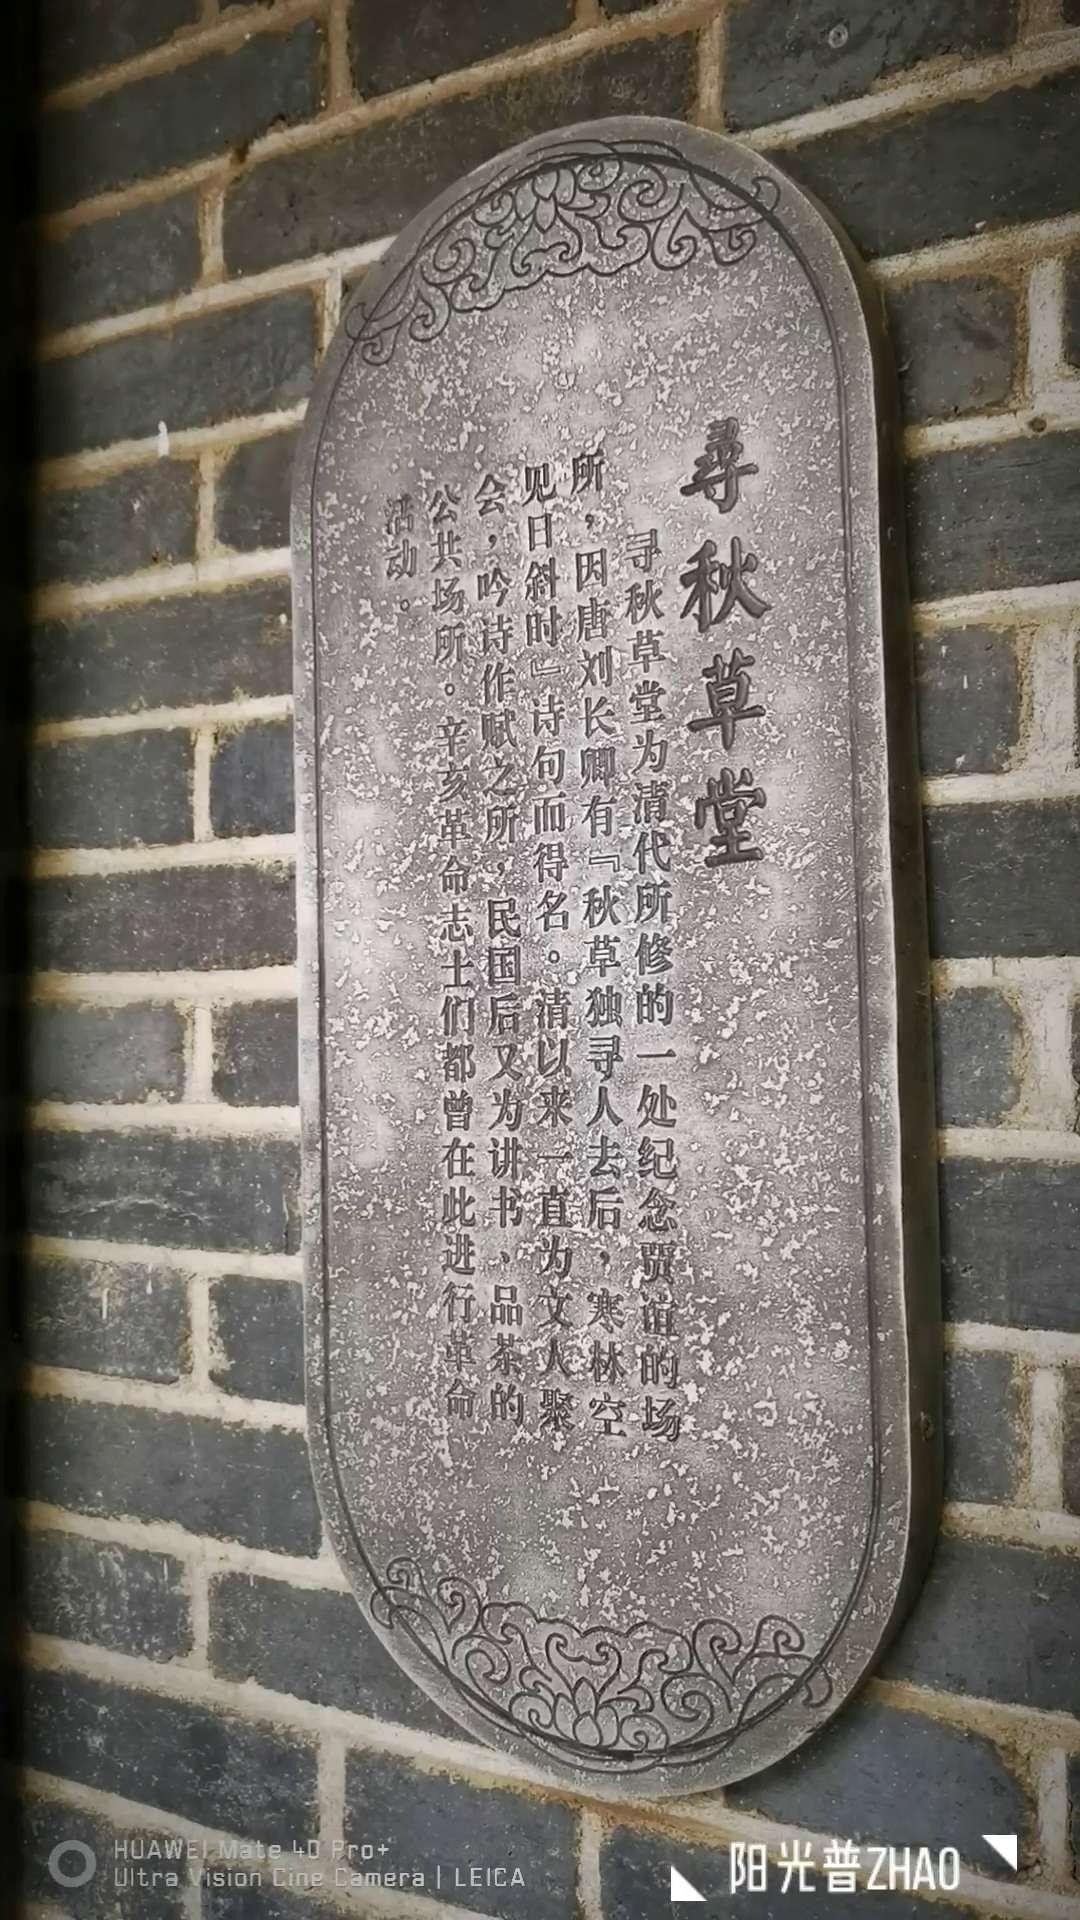 "【MATE 40 PRO+】贾谊故居:隐藏在闹市中的""圣地"",花粉随手拍-花粉俱乐部"